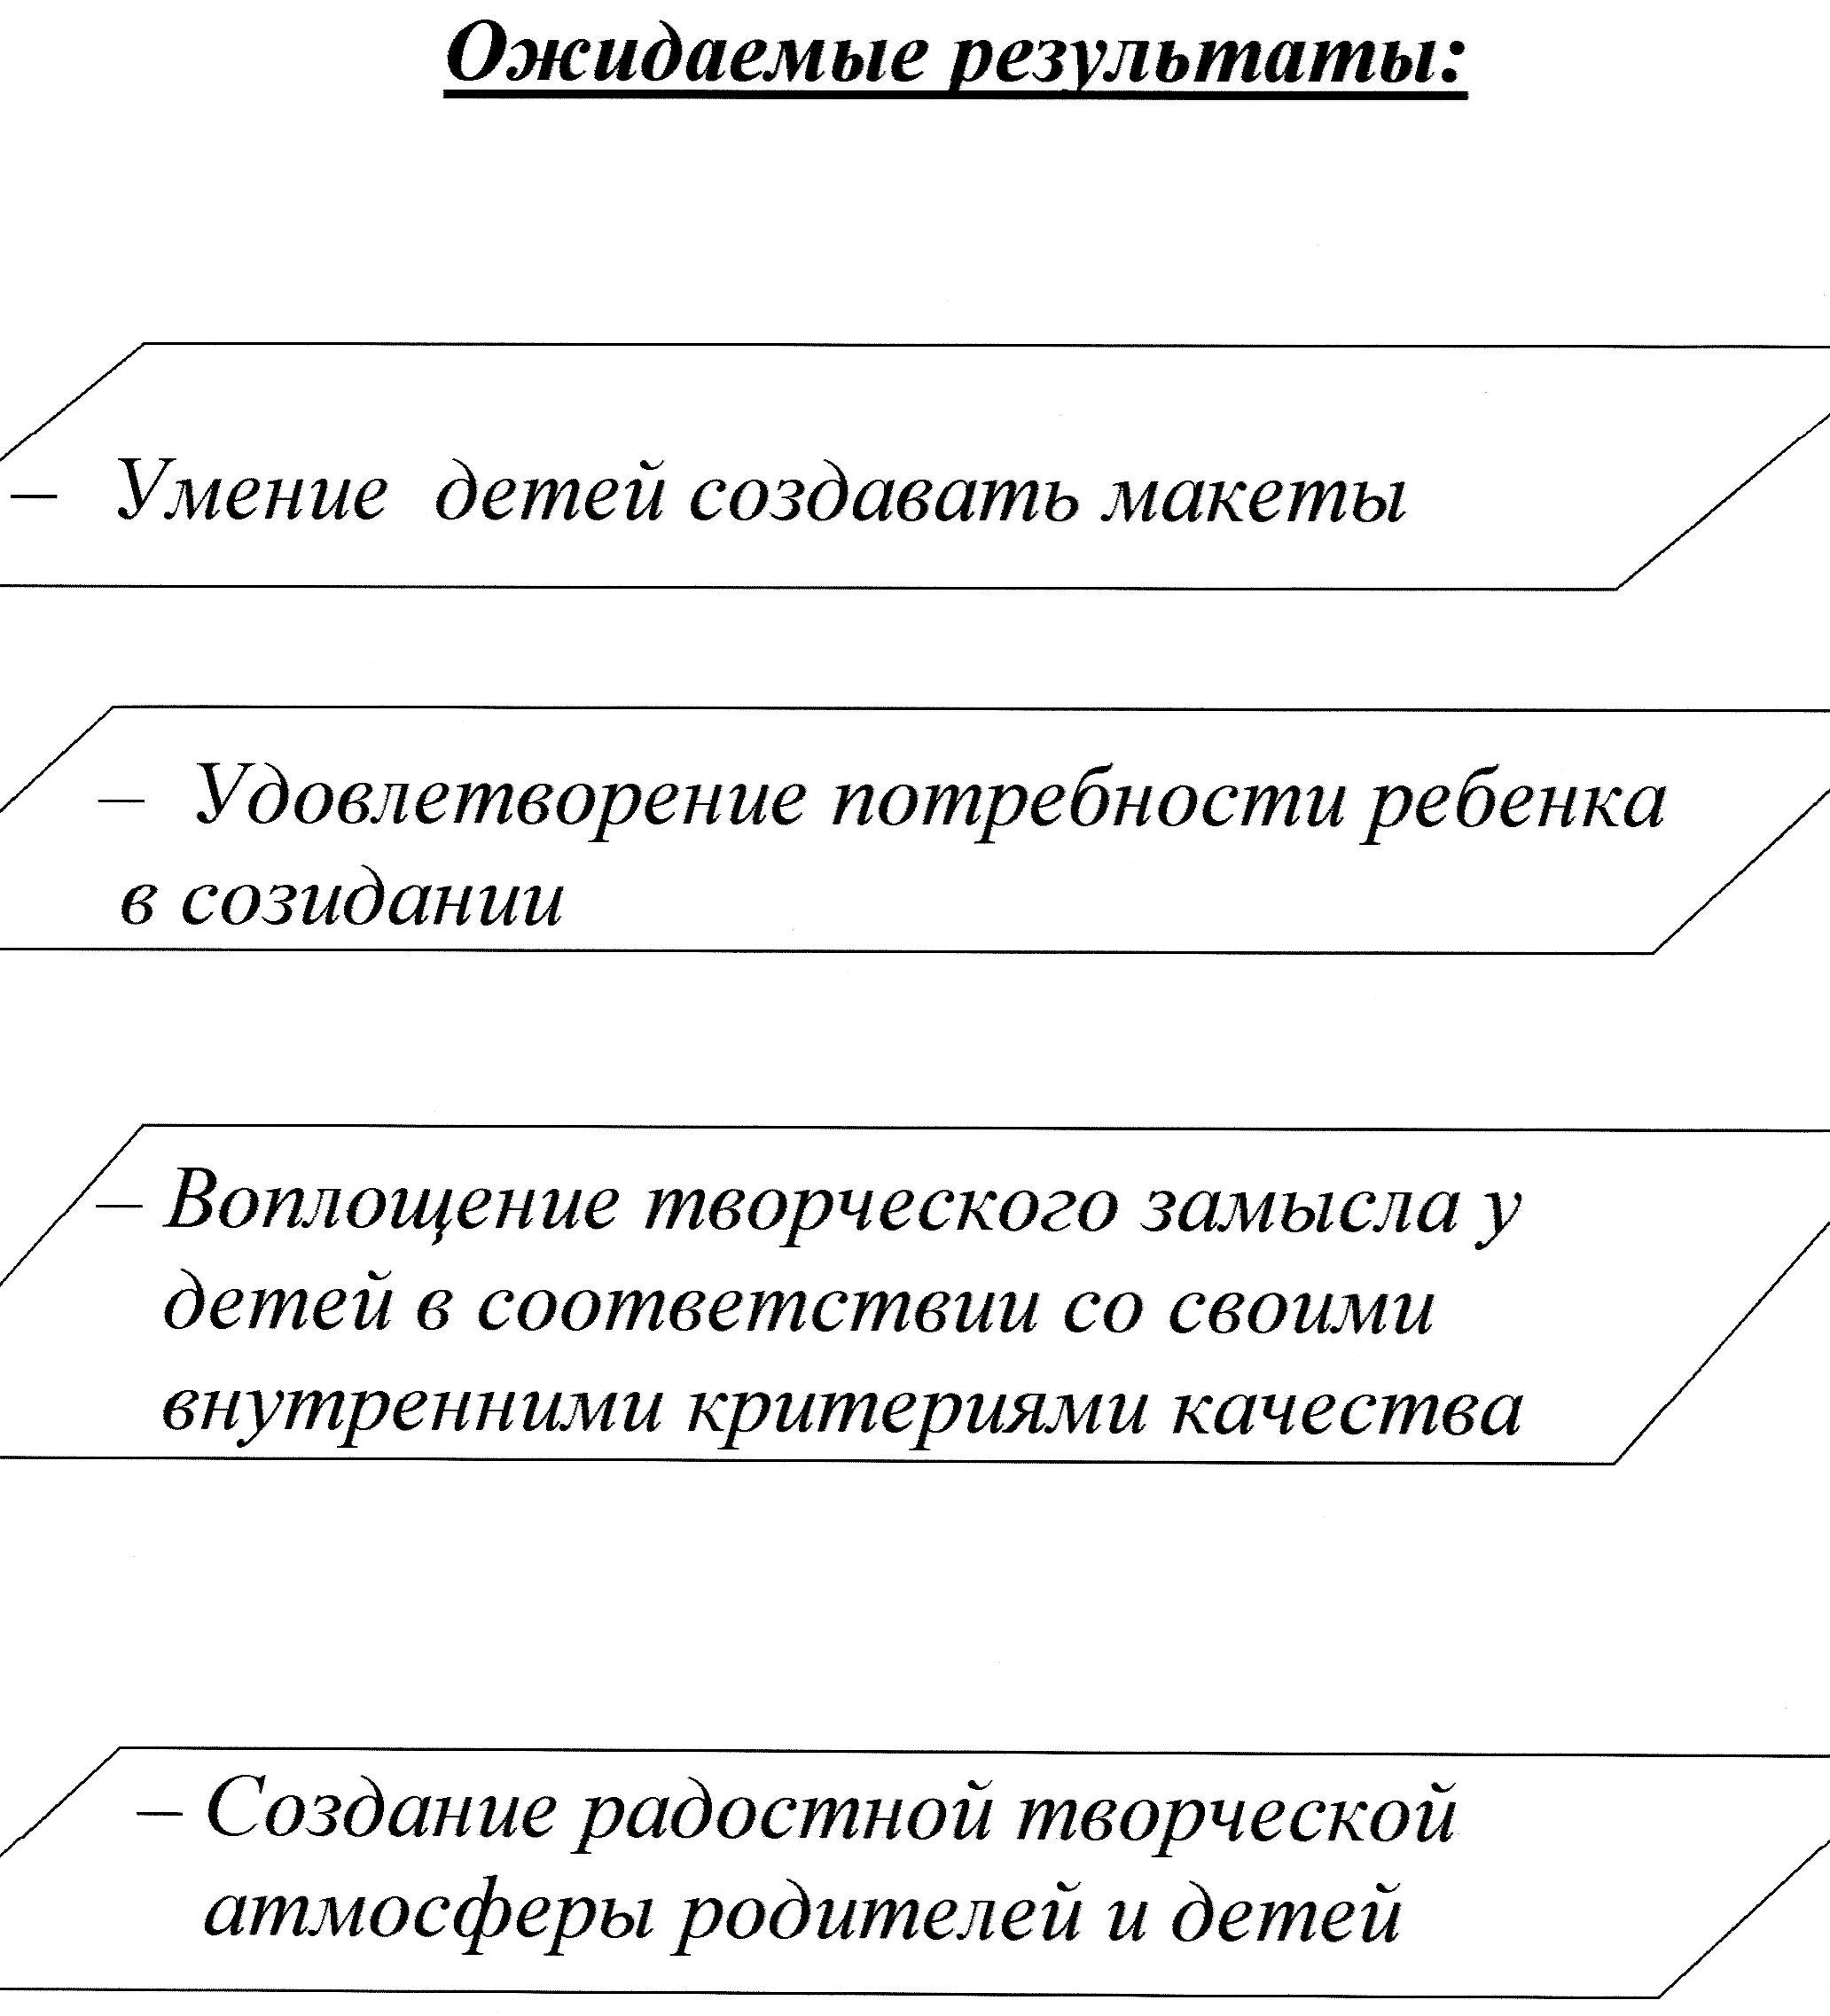 C:\Users\123\Desktop\проект Принько Т.И\img033.jpg